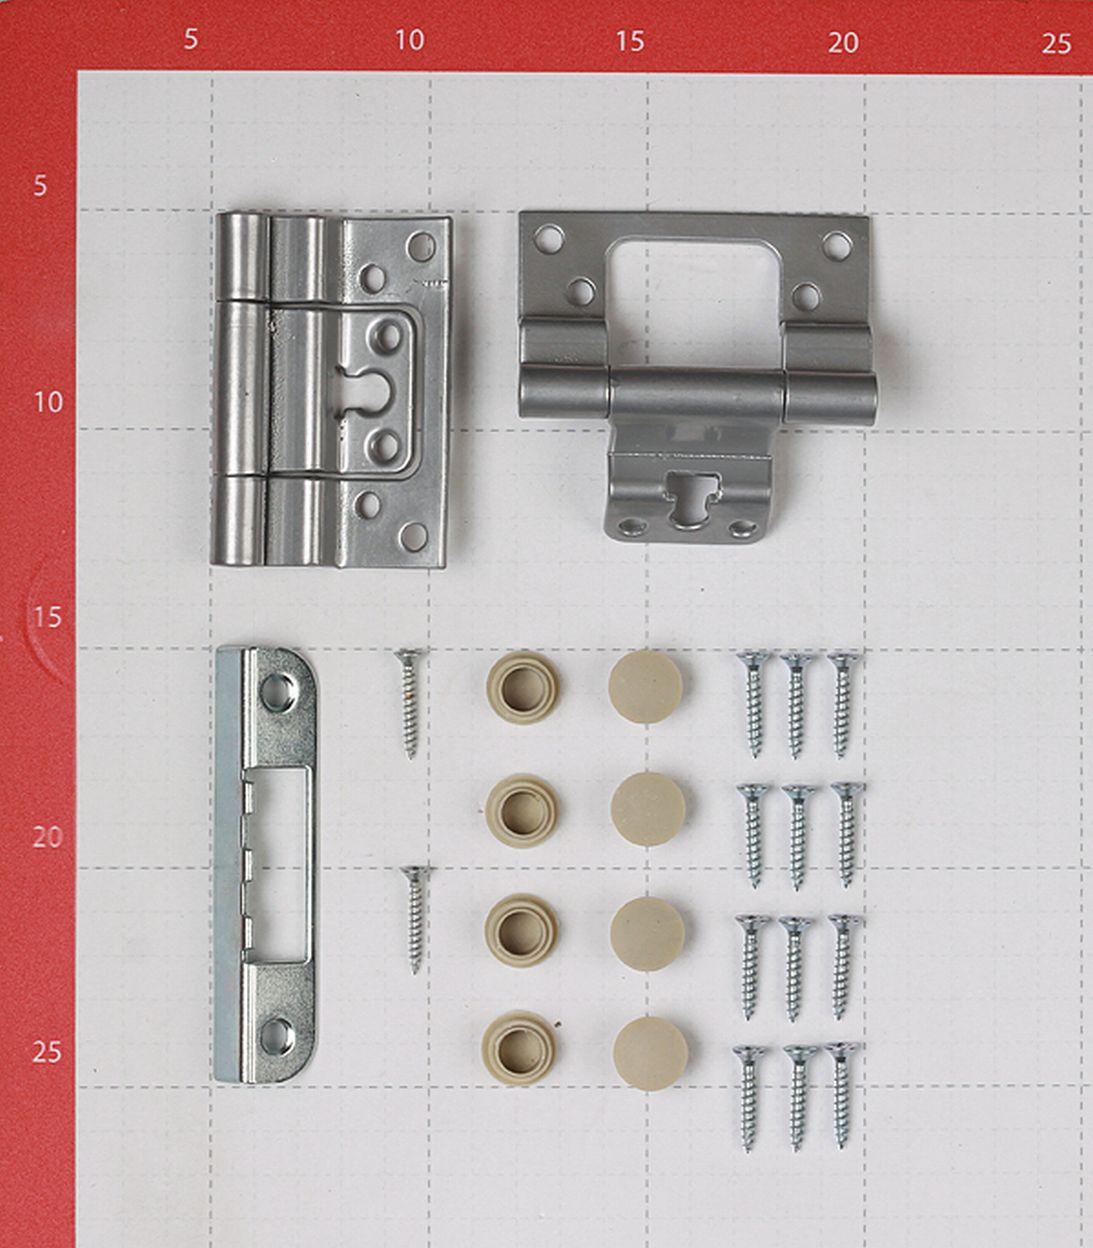 Коробка дверная VellDoris TREND, SMART экошпон капучино 38х80х2042 мм (759х2042 мм) (2,5 шт.)